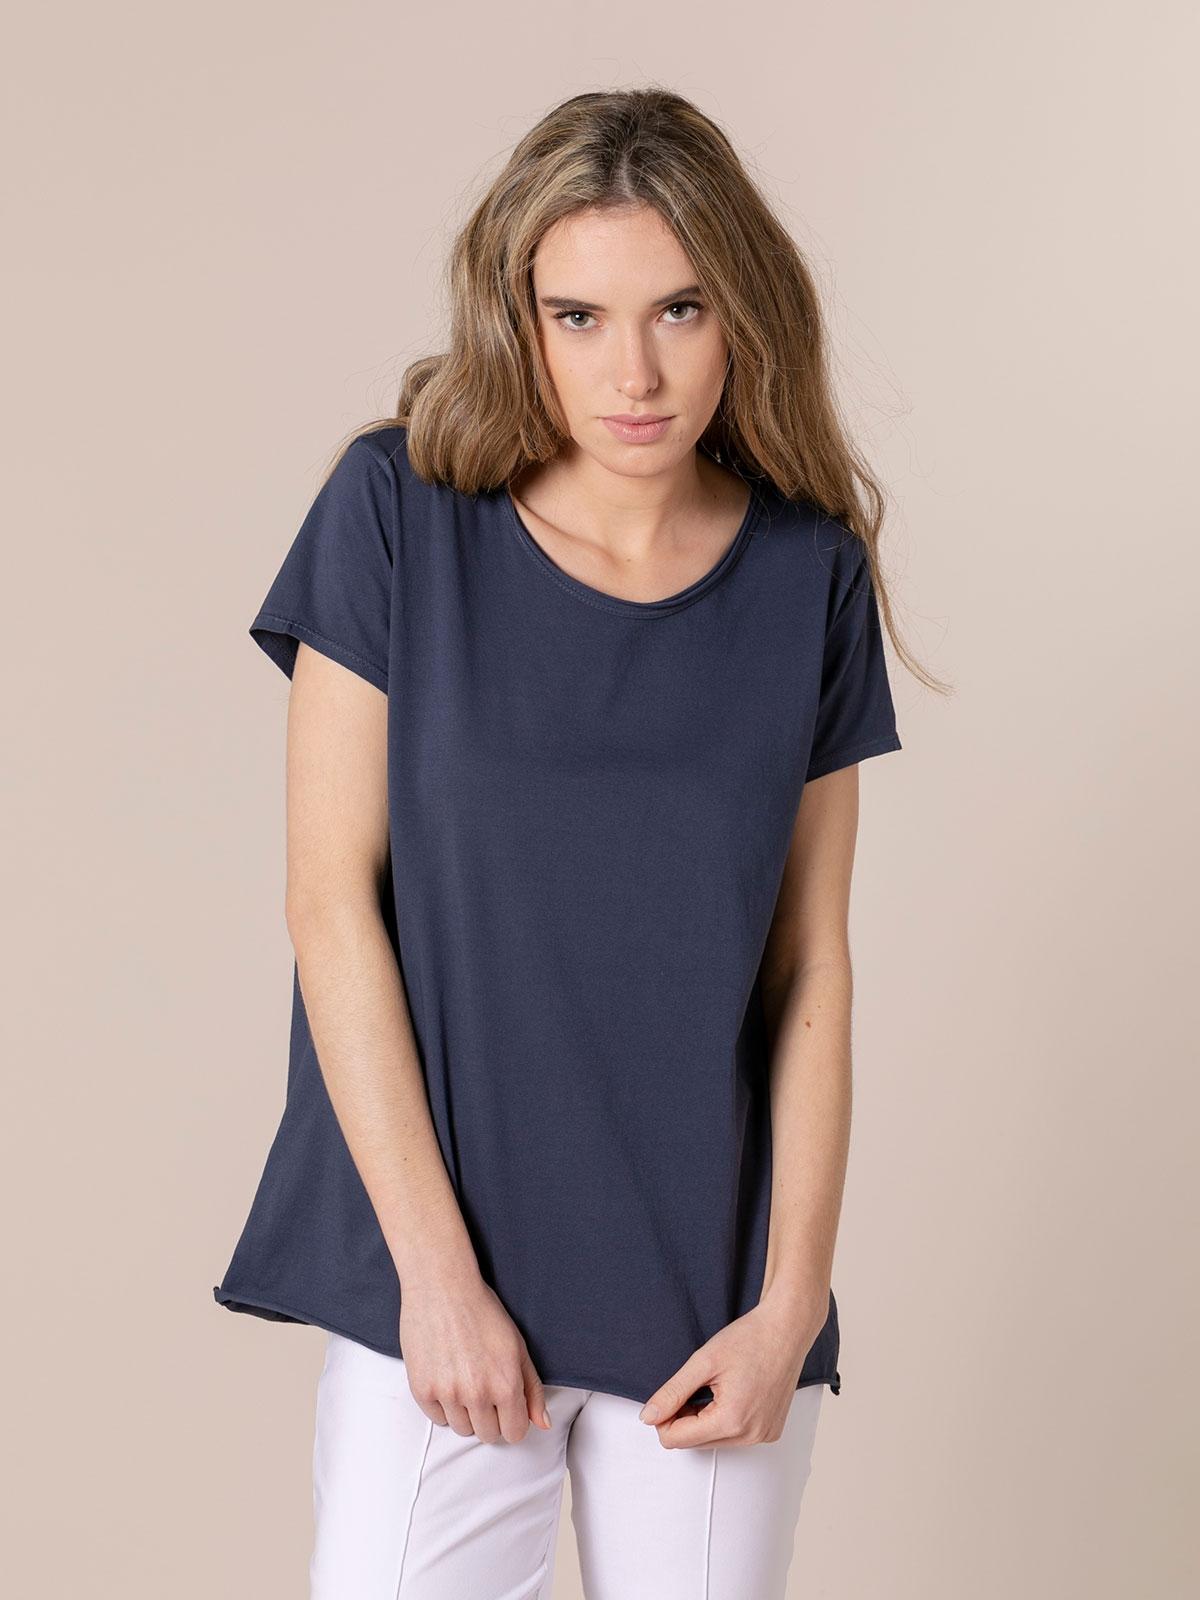 Woman Plain cotton T-shirt Blue Navy